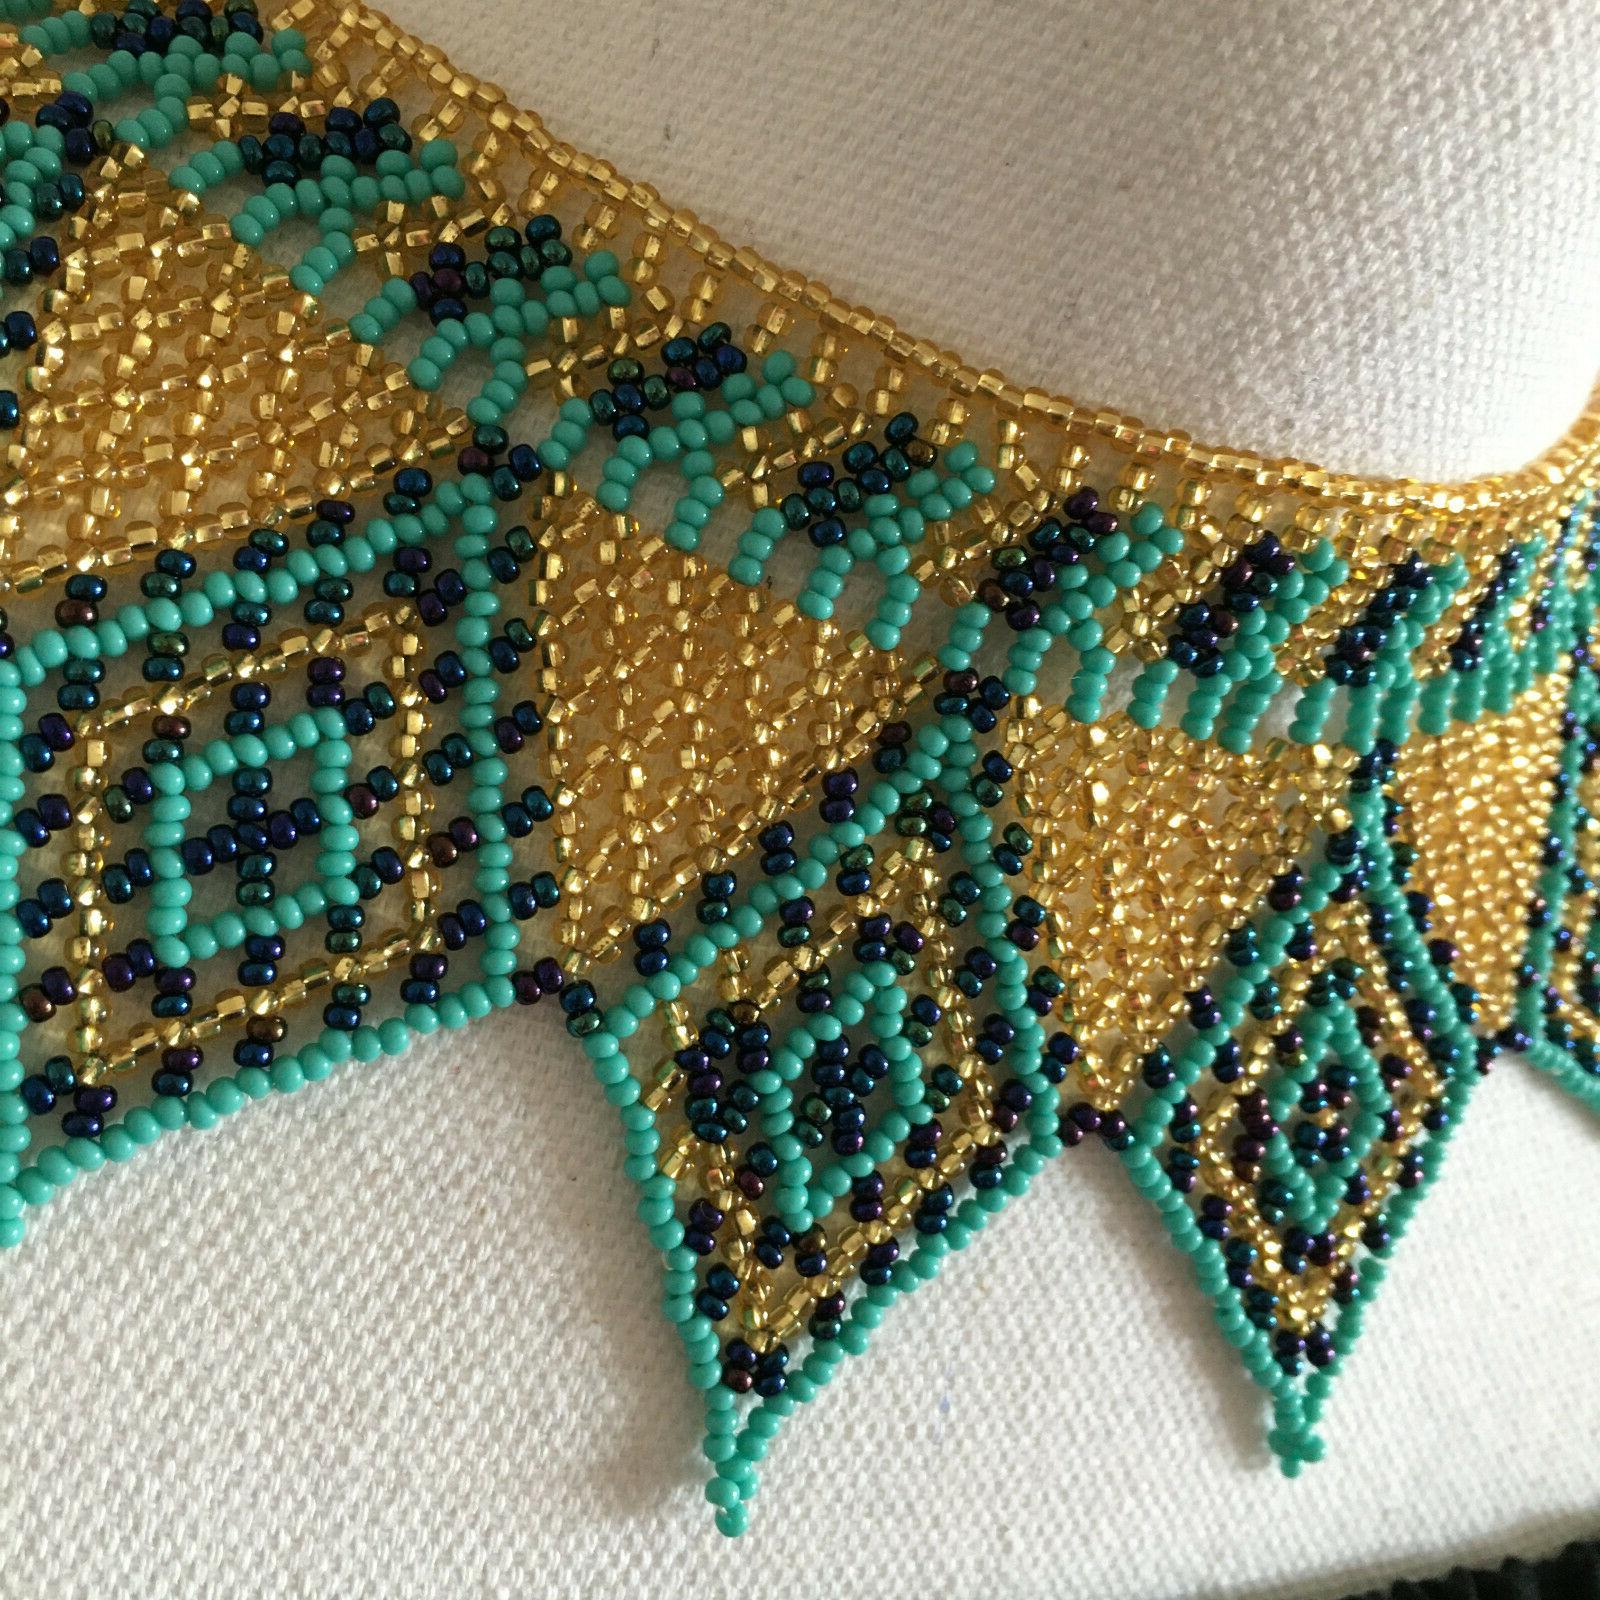 Women's Handmade Huichol Bead Necklace Jewelry - Her